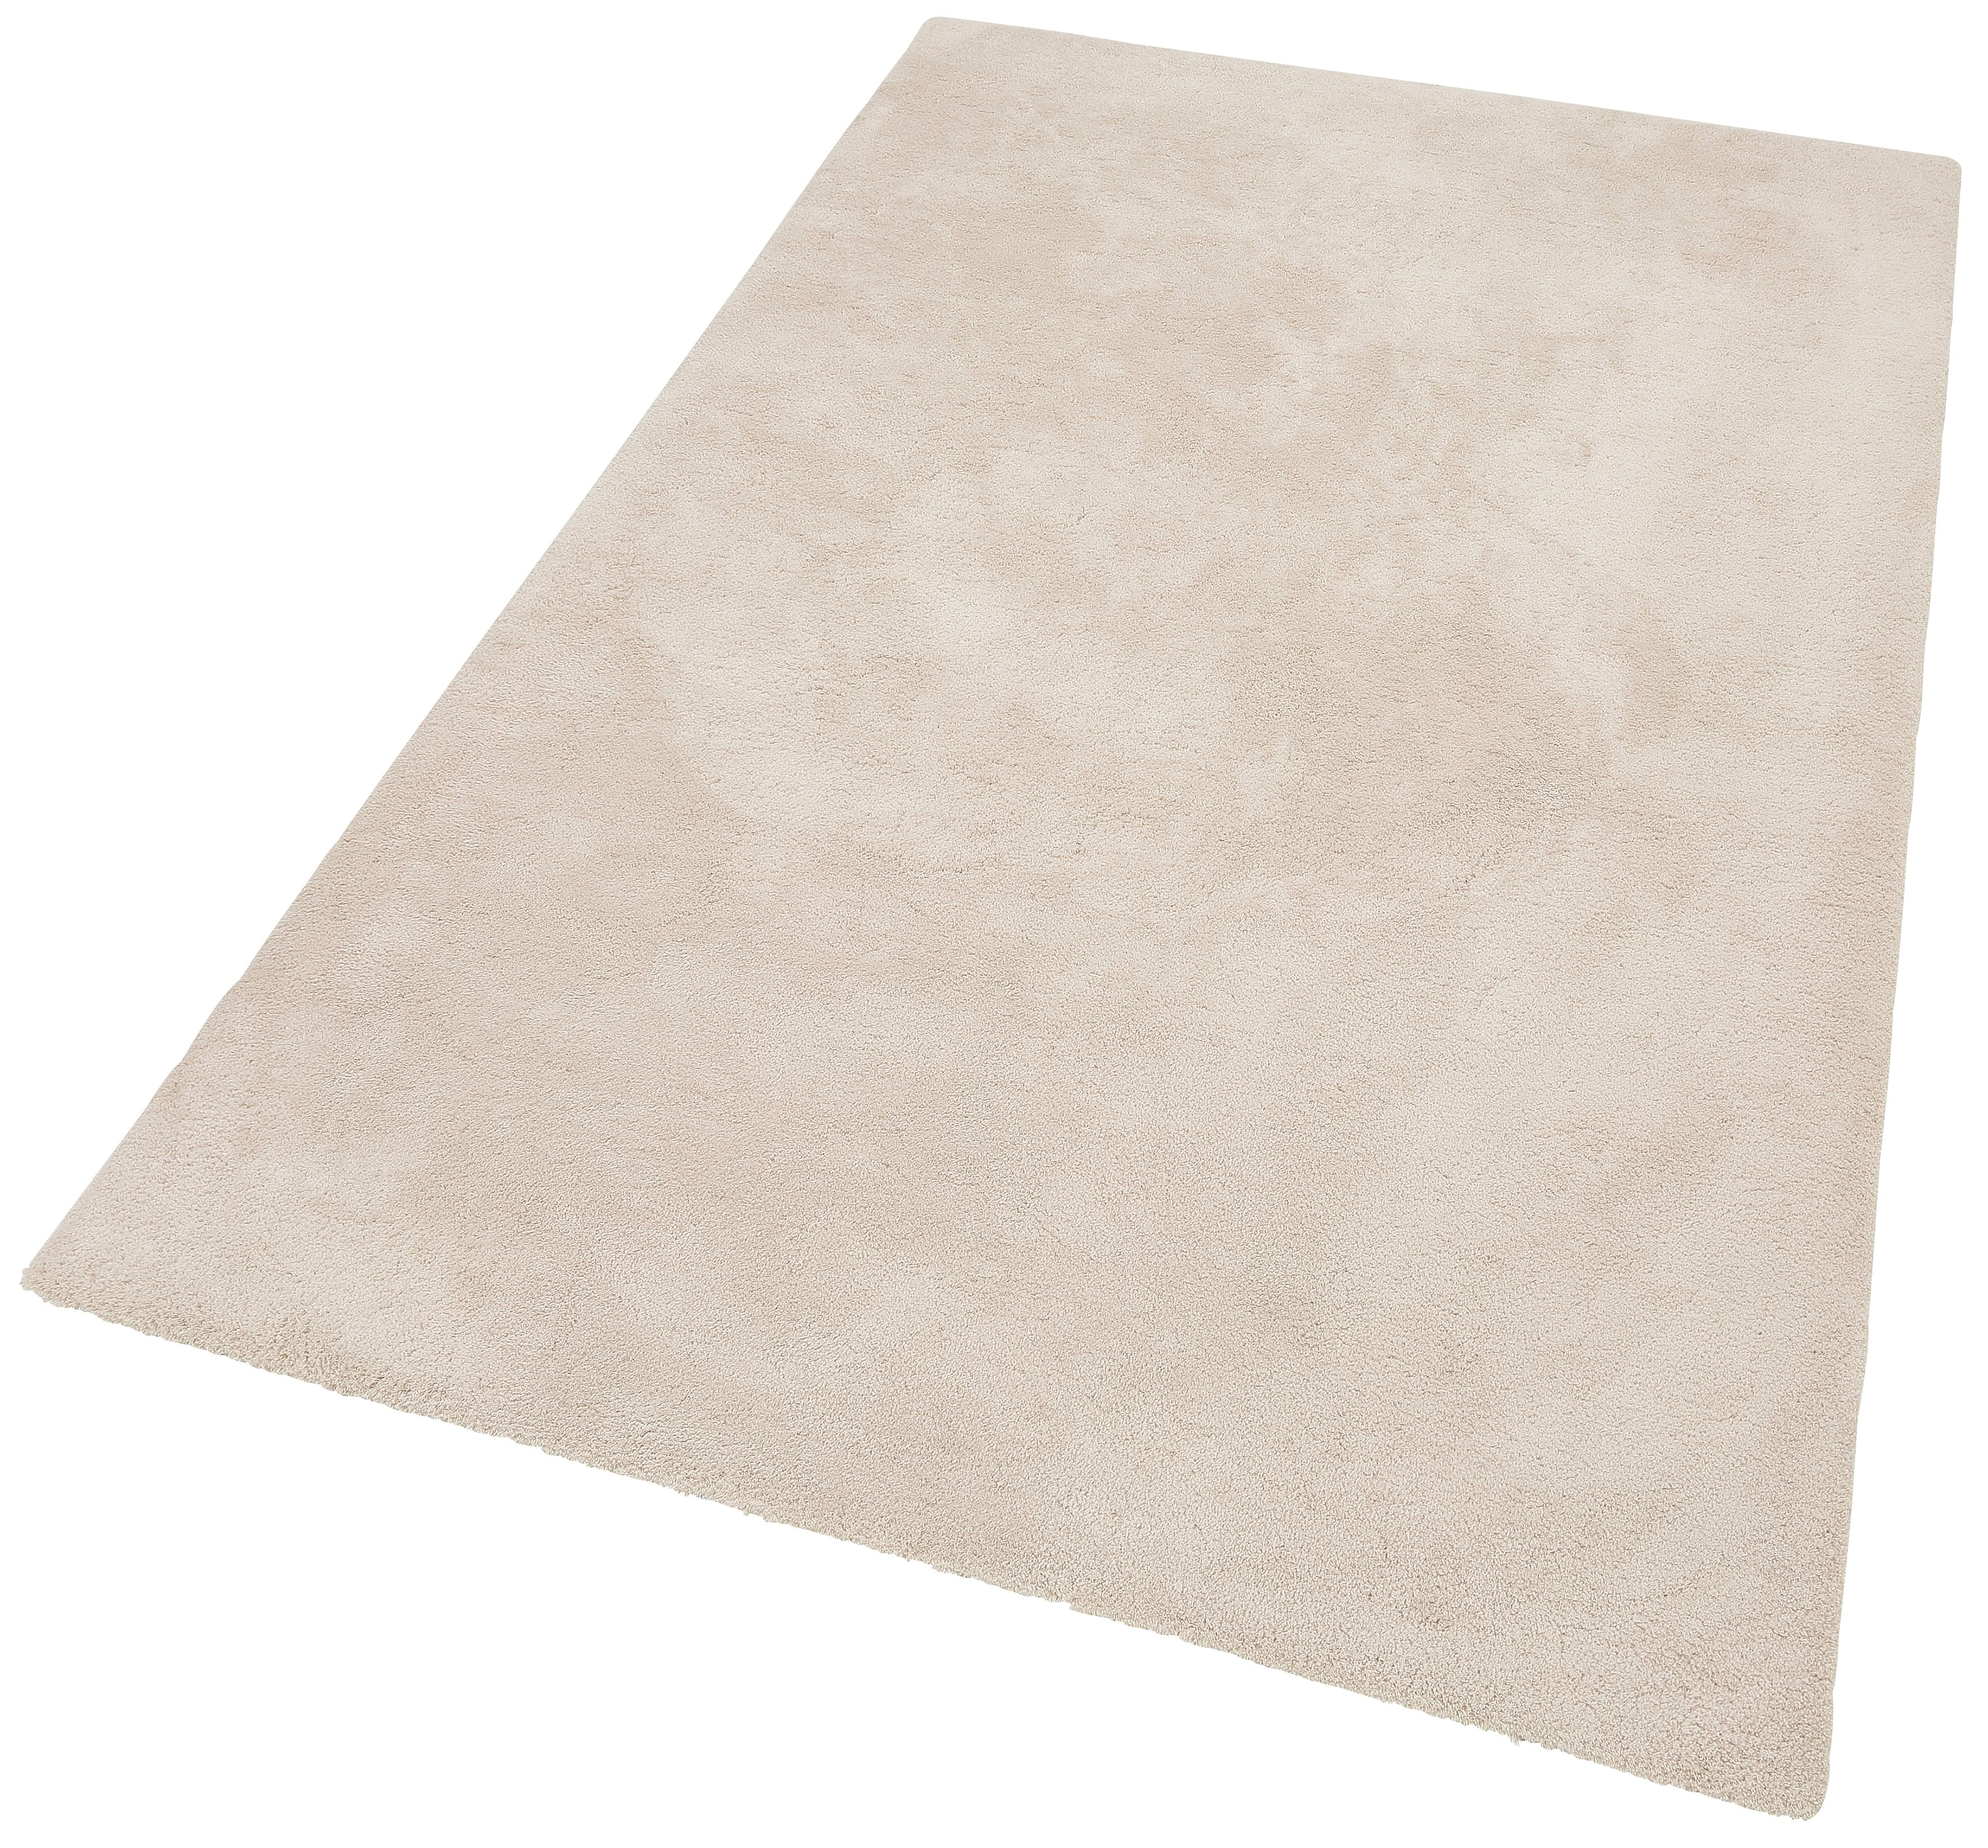 hochflor teppich magong my home selection rechteckig h he 25 mm natur l b 90 60 cm l b. Black Bedroom Furniture Sets. Home Design Ideas